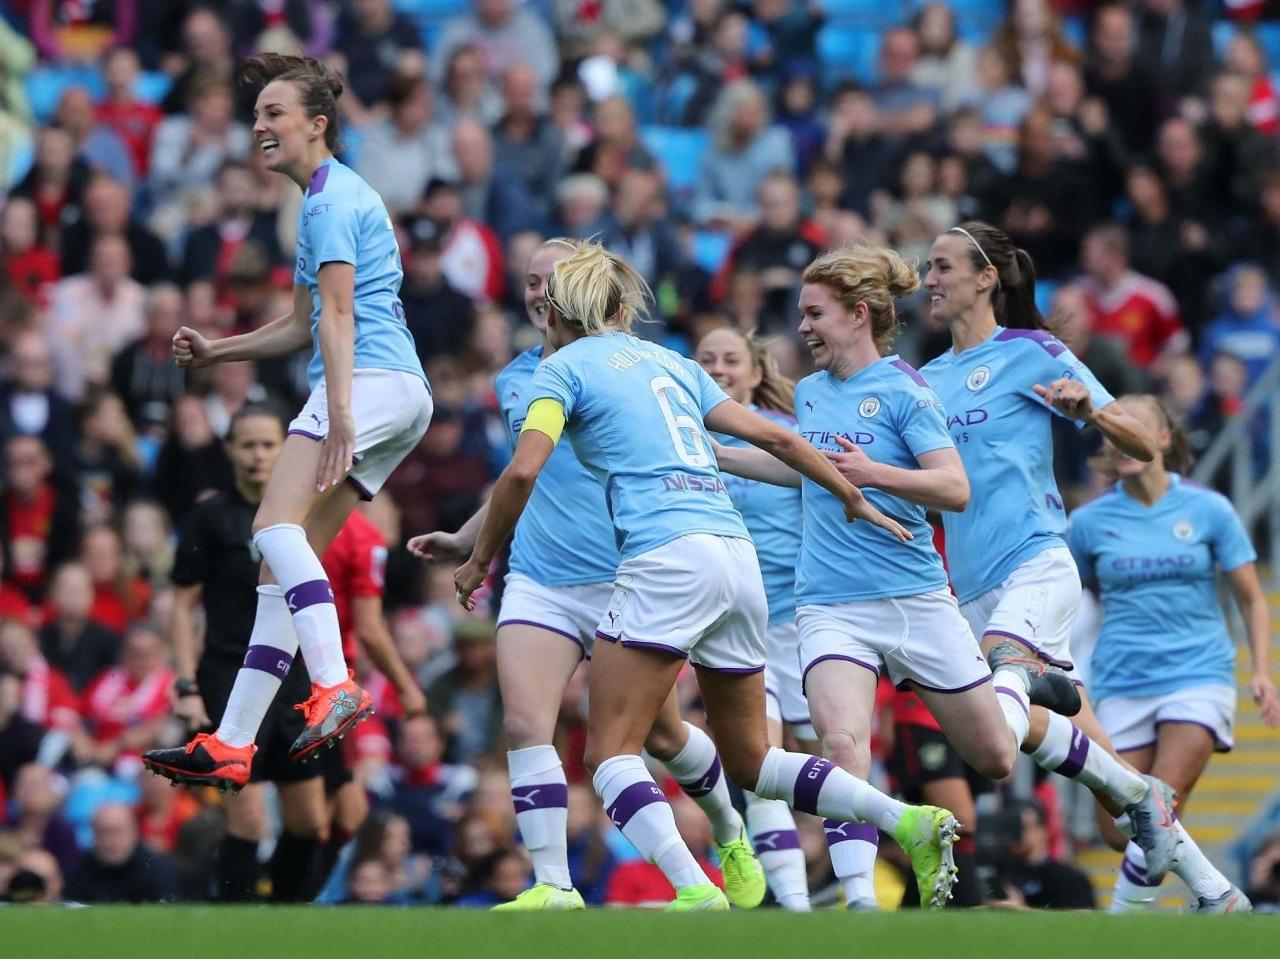 Manchester City Women's Football Club